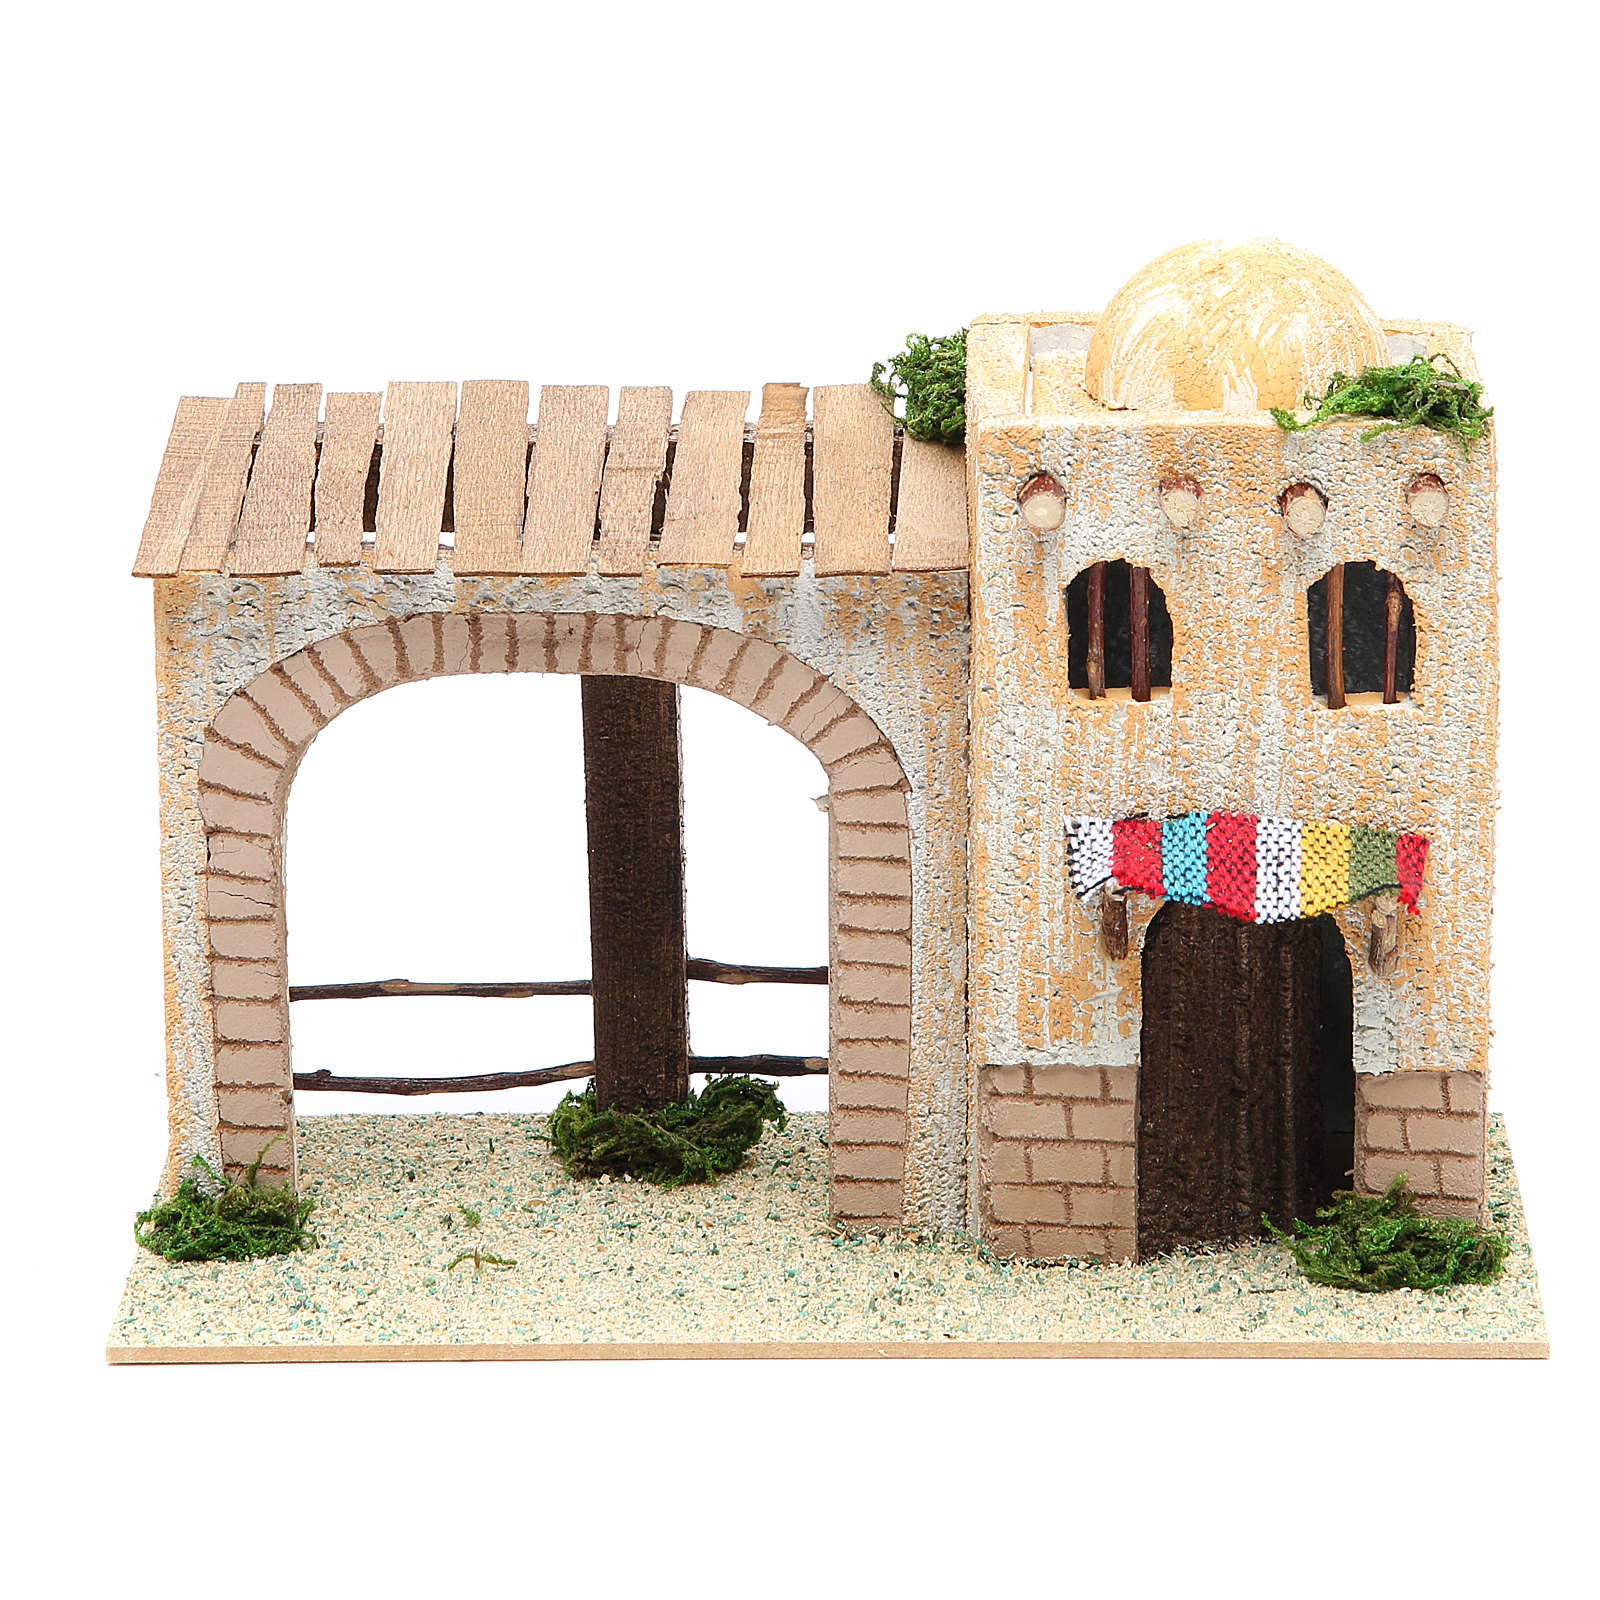 Maison arabe avec véranda 22x13x14 cm 4